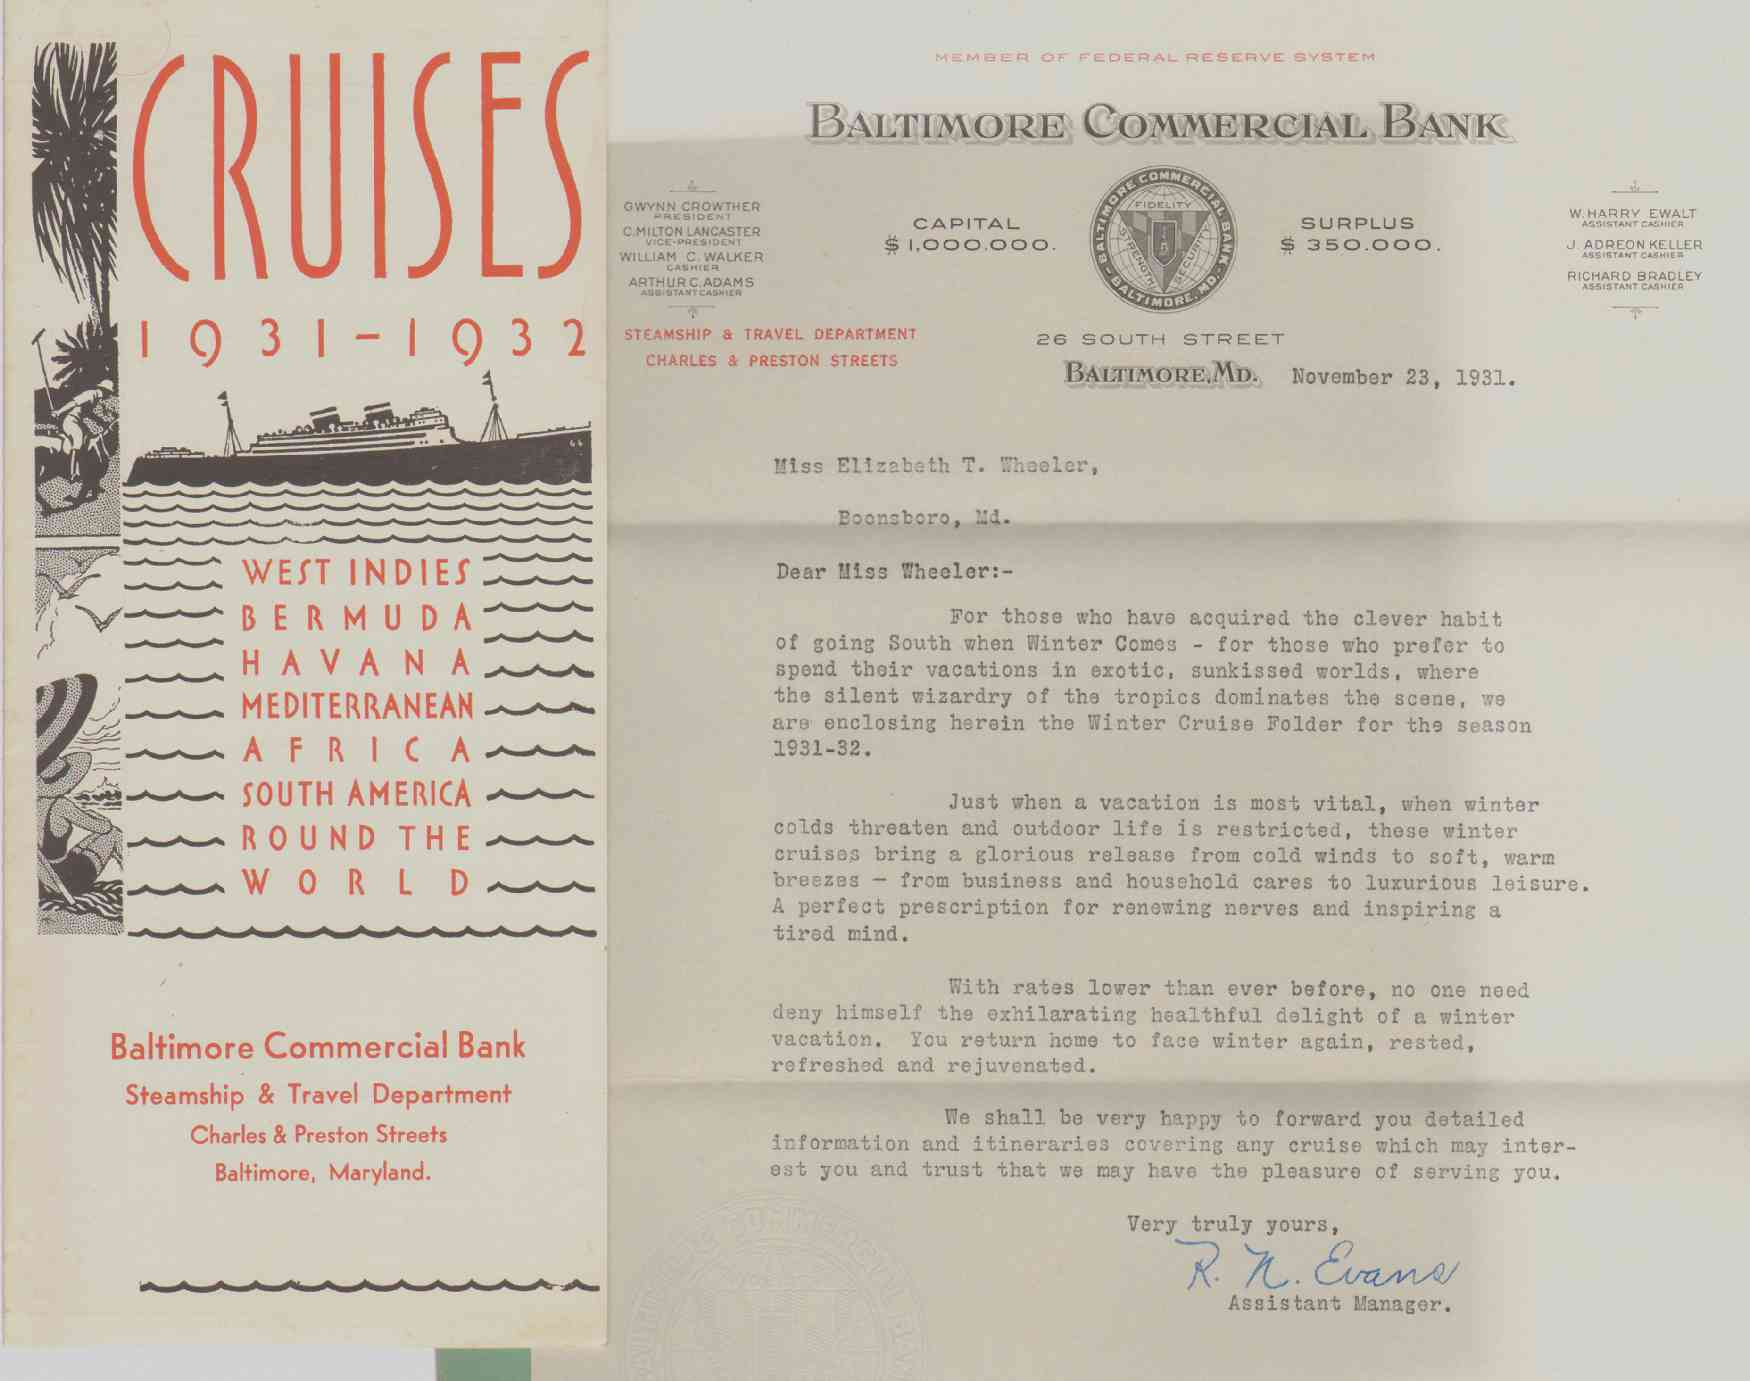 Image for CRUISES 1931 - 1932 West Indies Bermuda Havana Mediterranean Africa South America Round the World